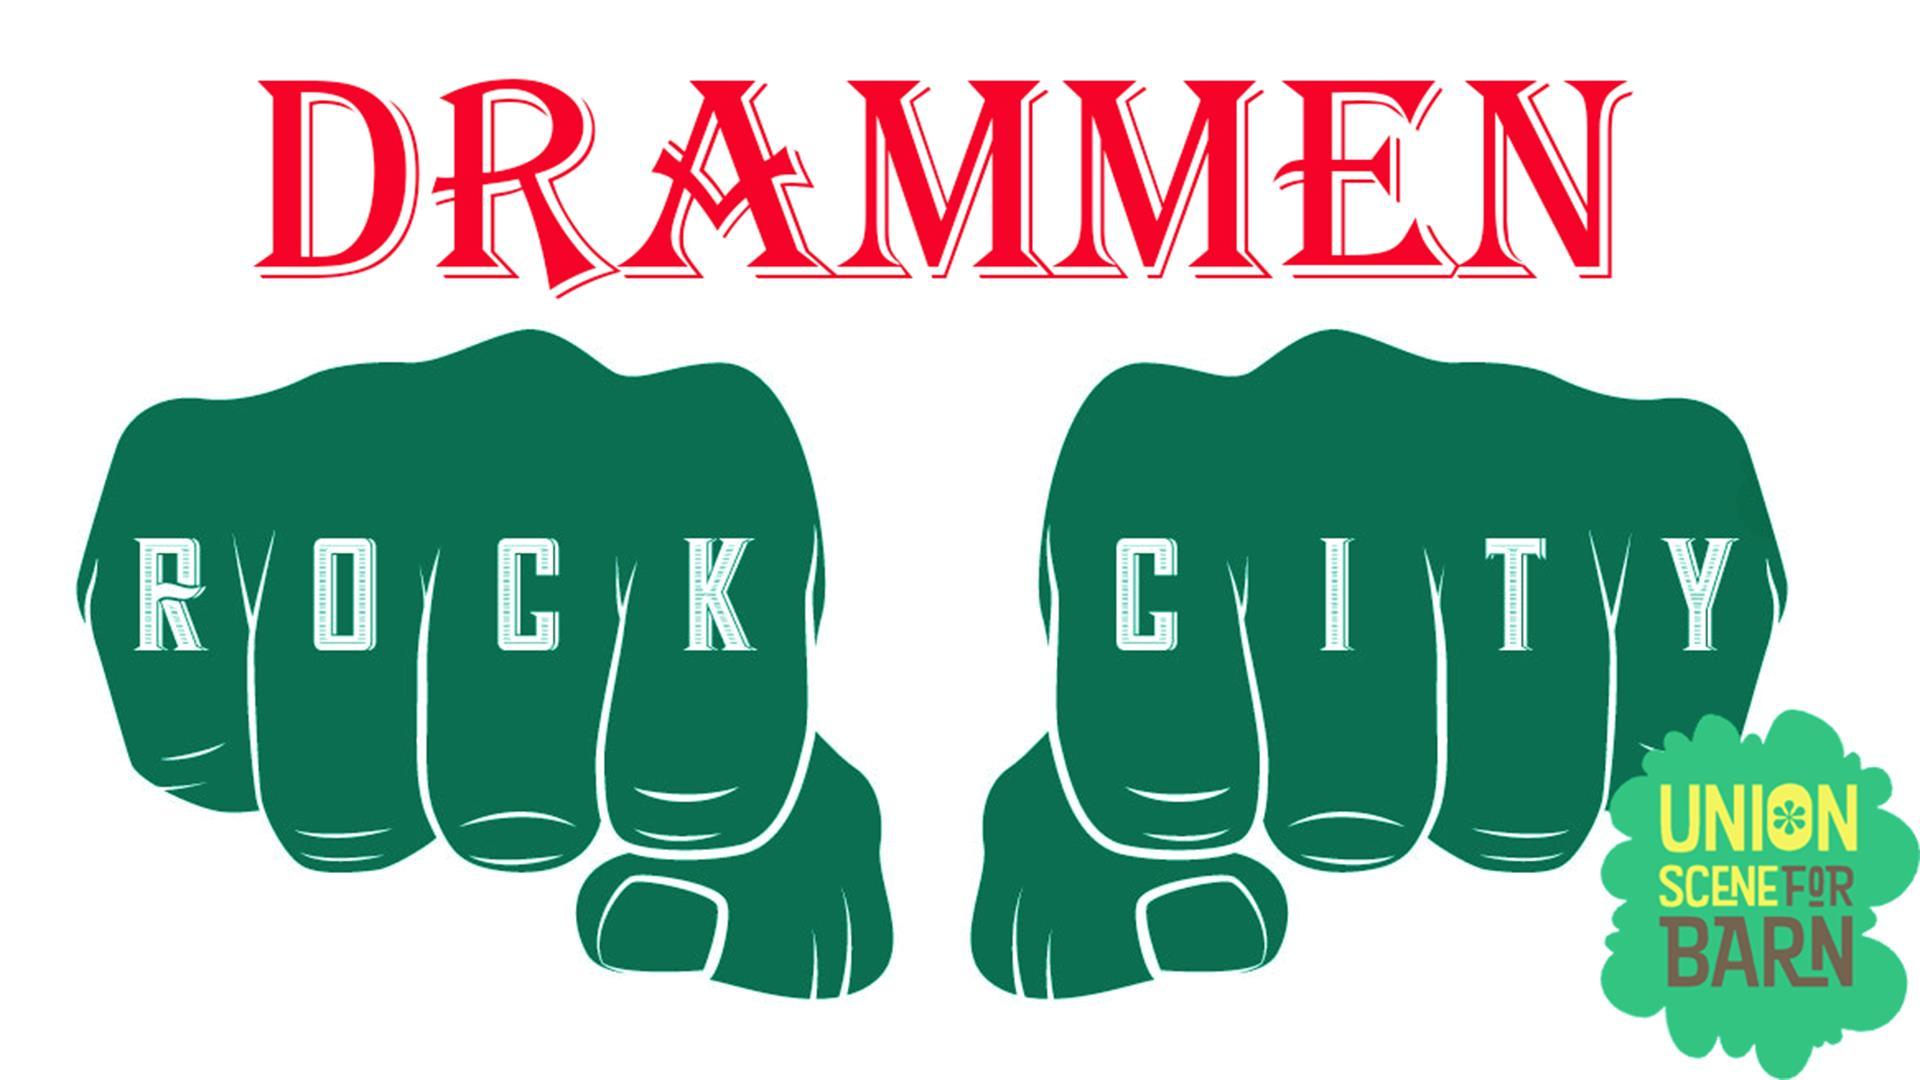 Drammen Rock City